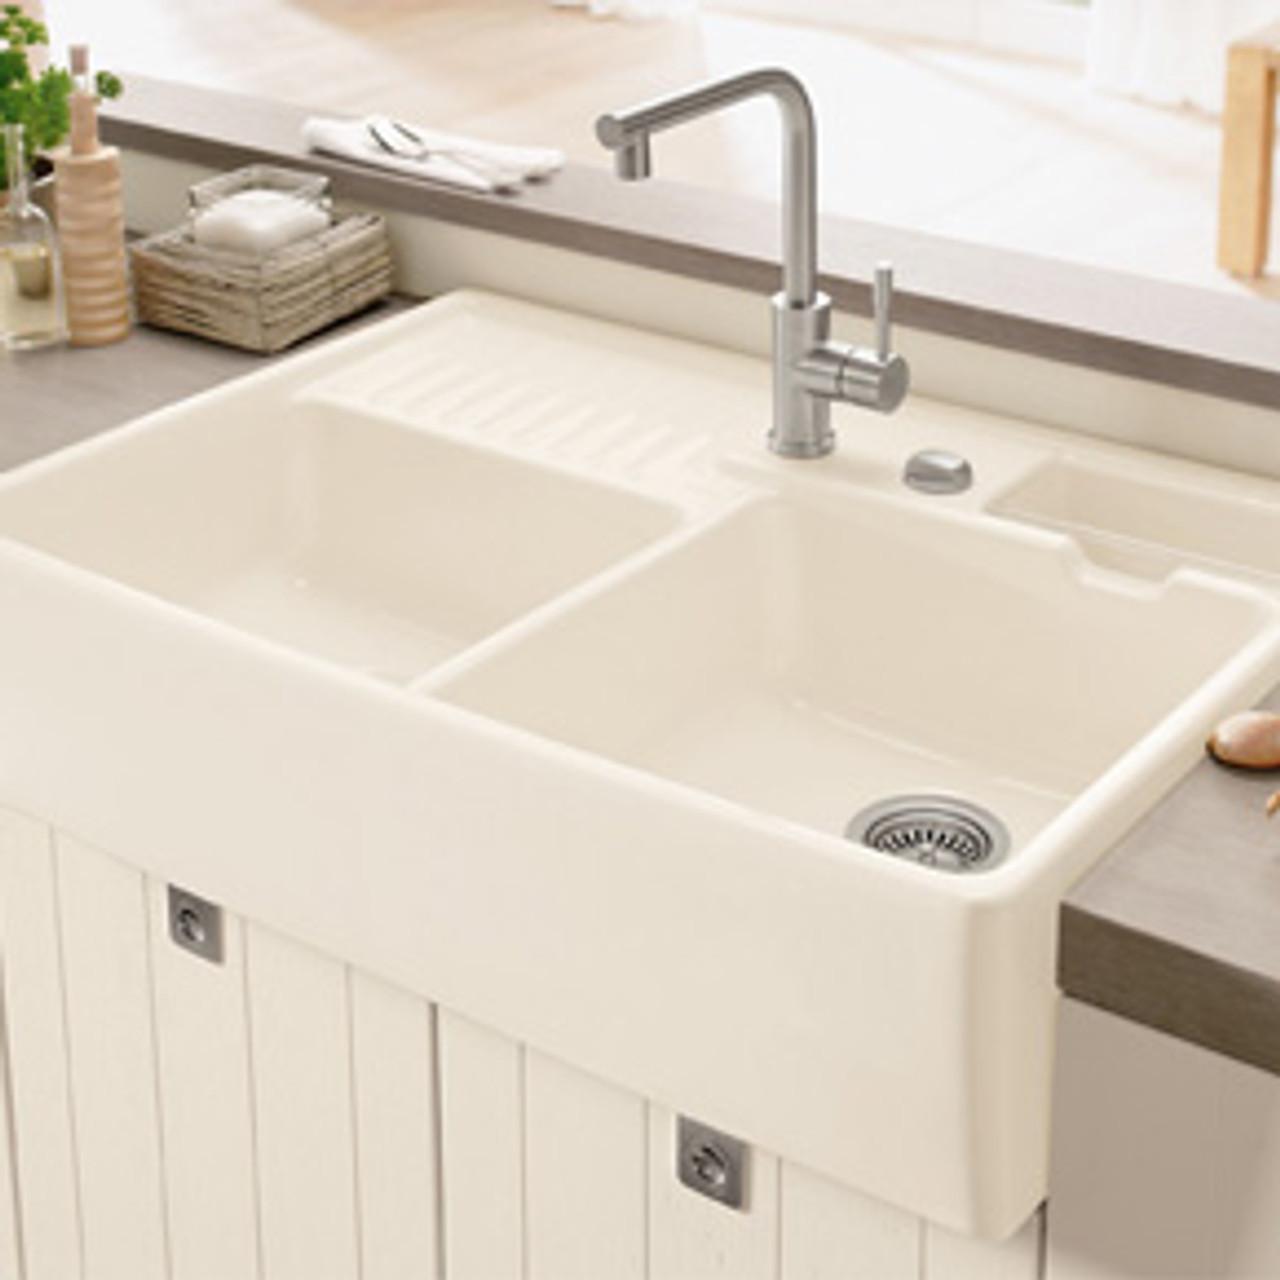 Villeroy & Boch Butler 90 (Double-bowl sink Modules) Kitchen Sink ...